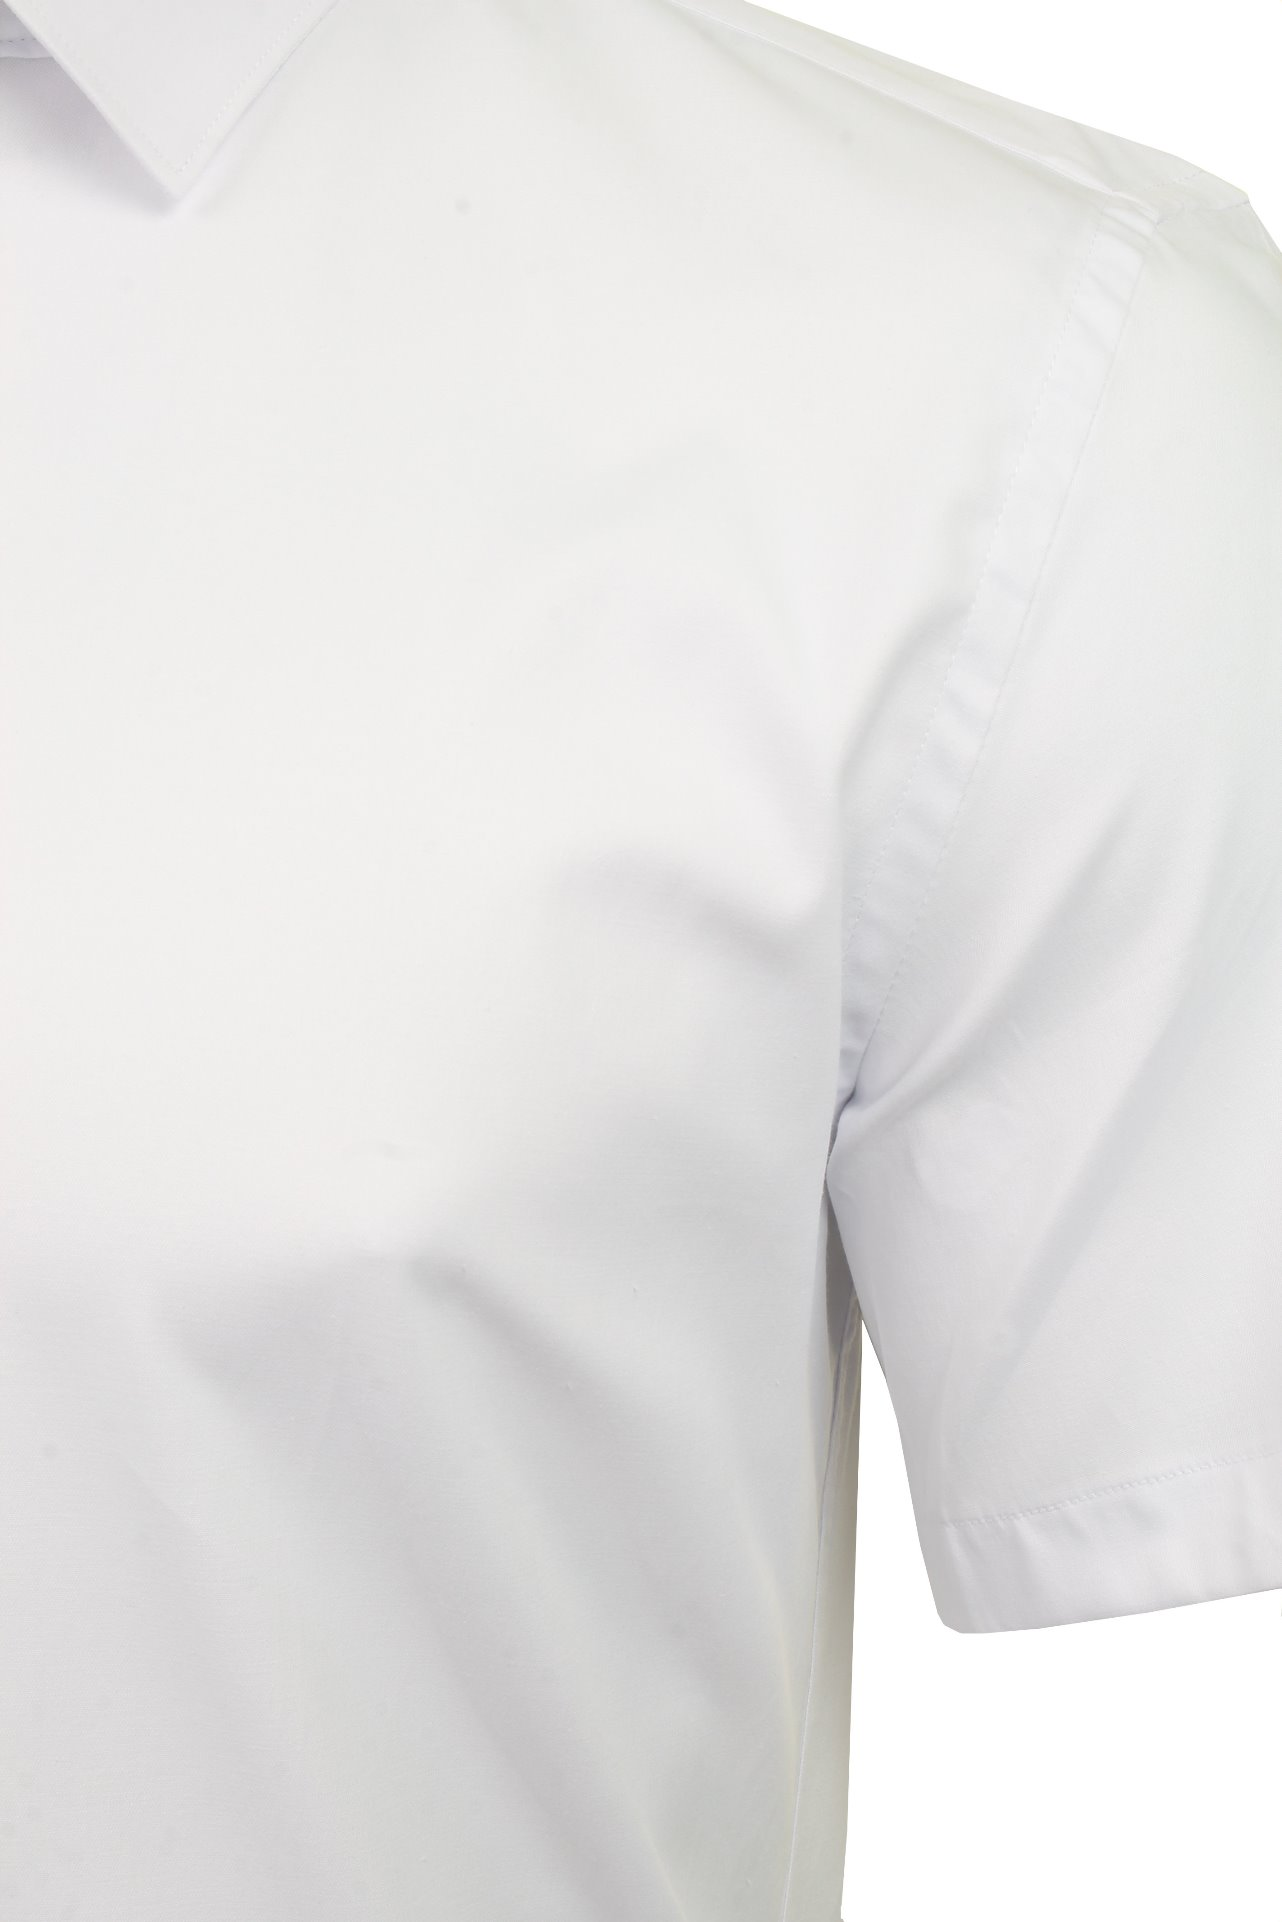 Xact-para-Hombre-de-Manga-Corta-Camisa-Slim-Fit-Popelin-del-estiramiento miniatura 12